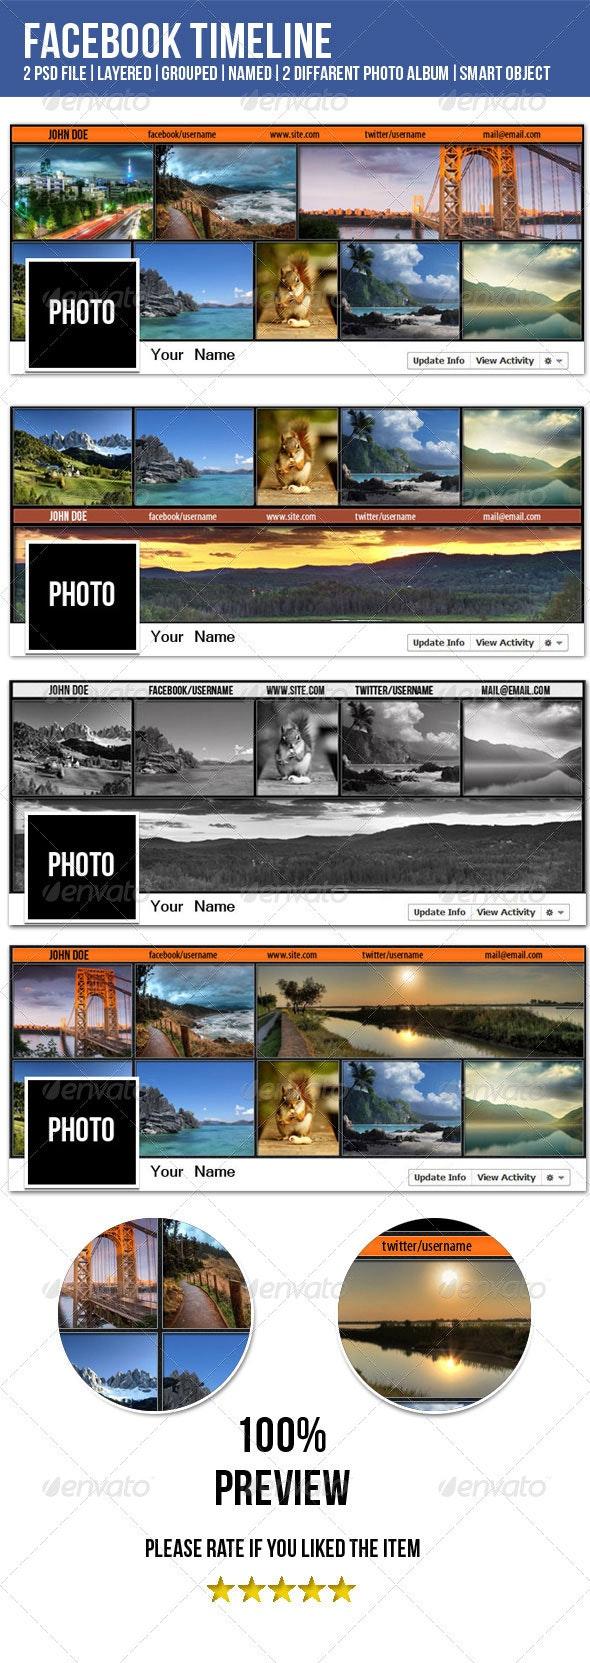 FB Timeline for photographer - Facebook Timeline Covers Social Media